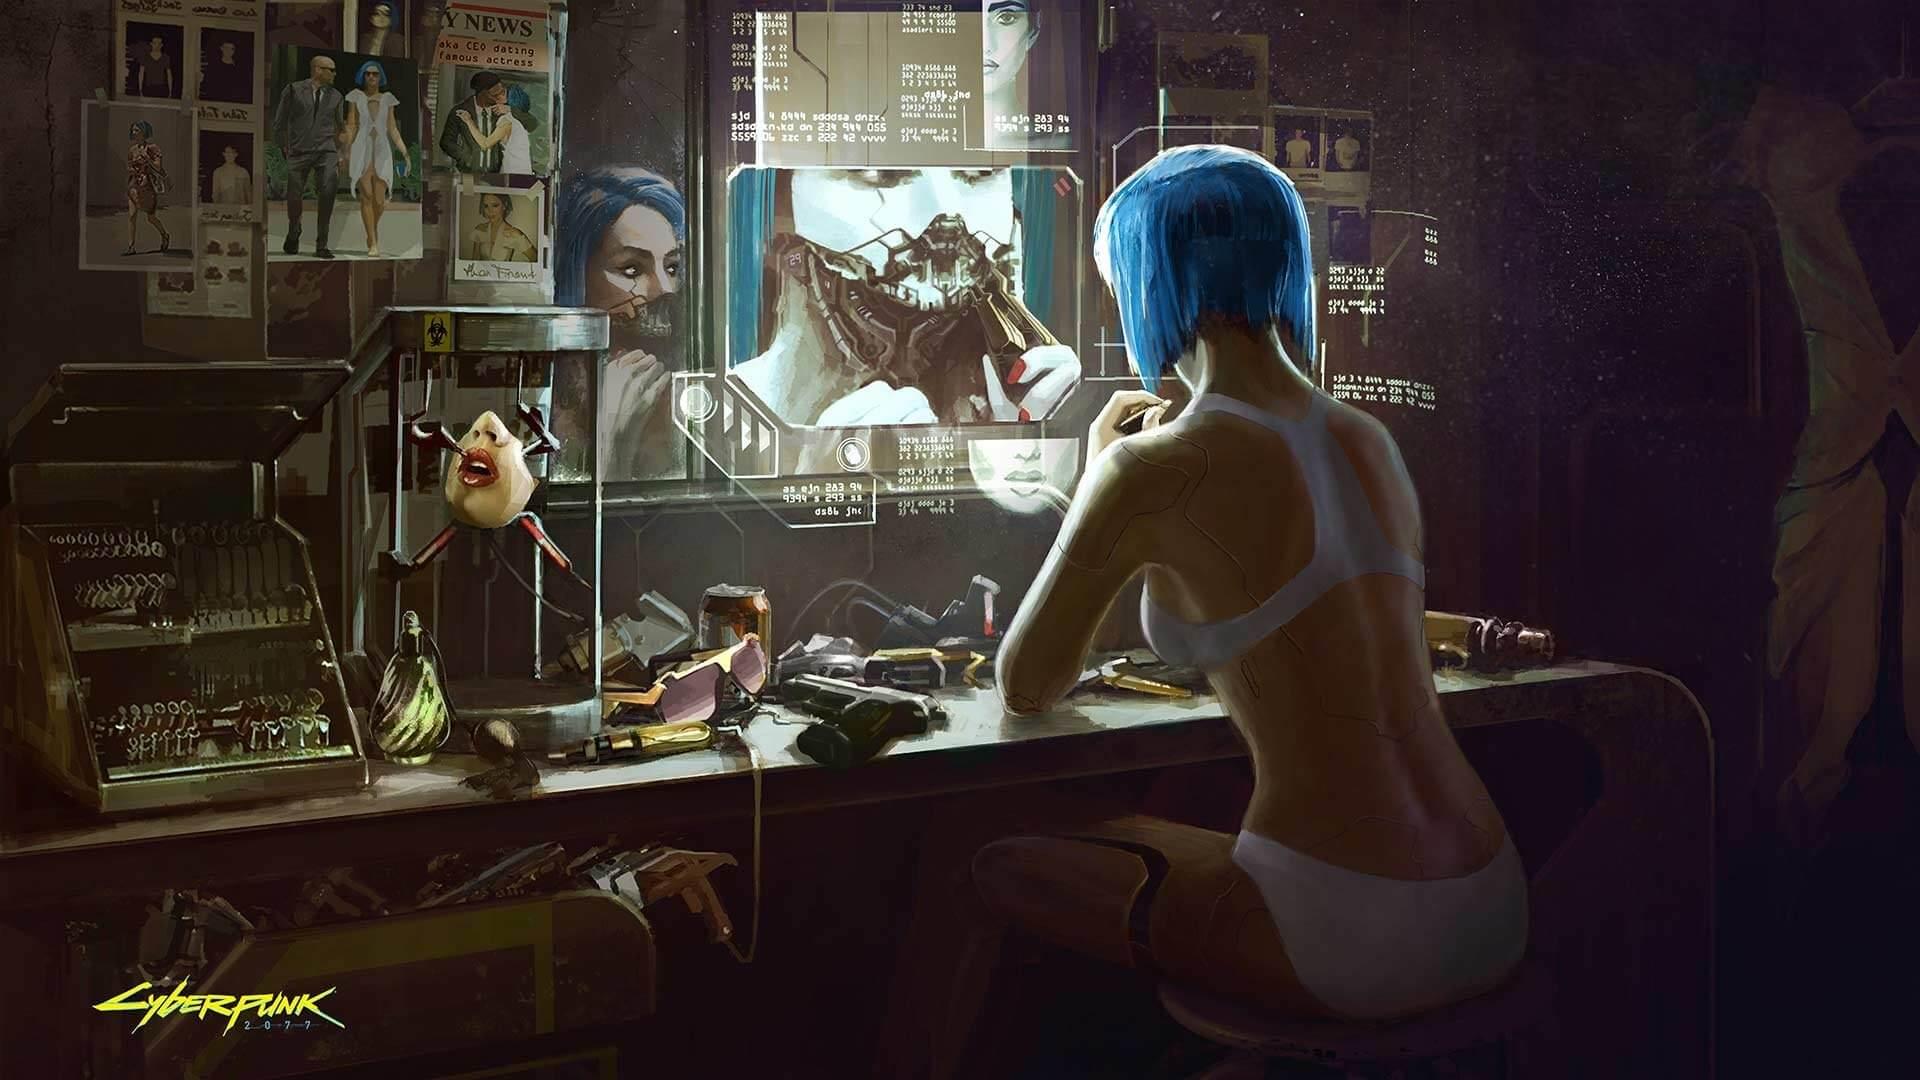 Cyberpunk 2077 permitirá bloquear desnudos y música con copyright